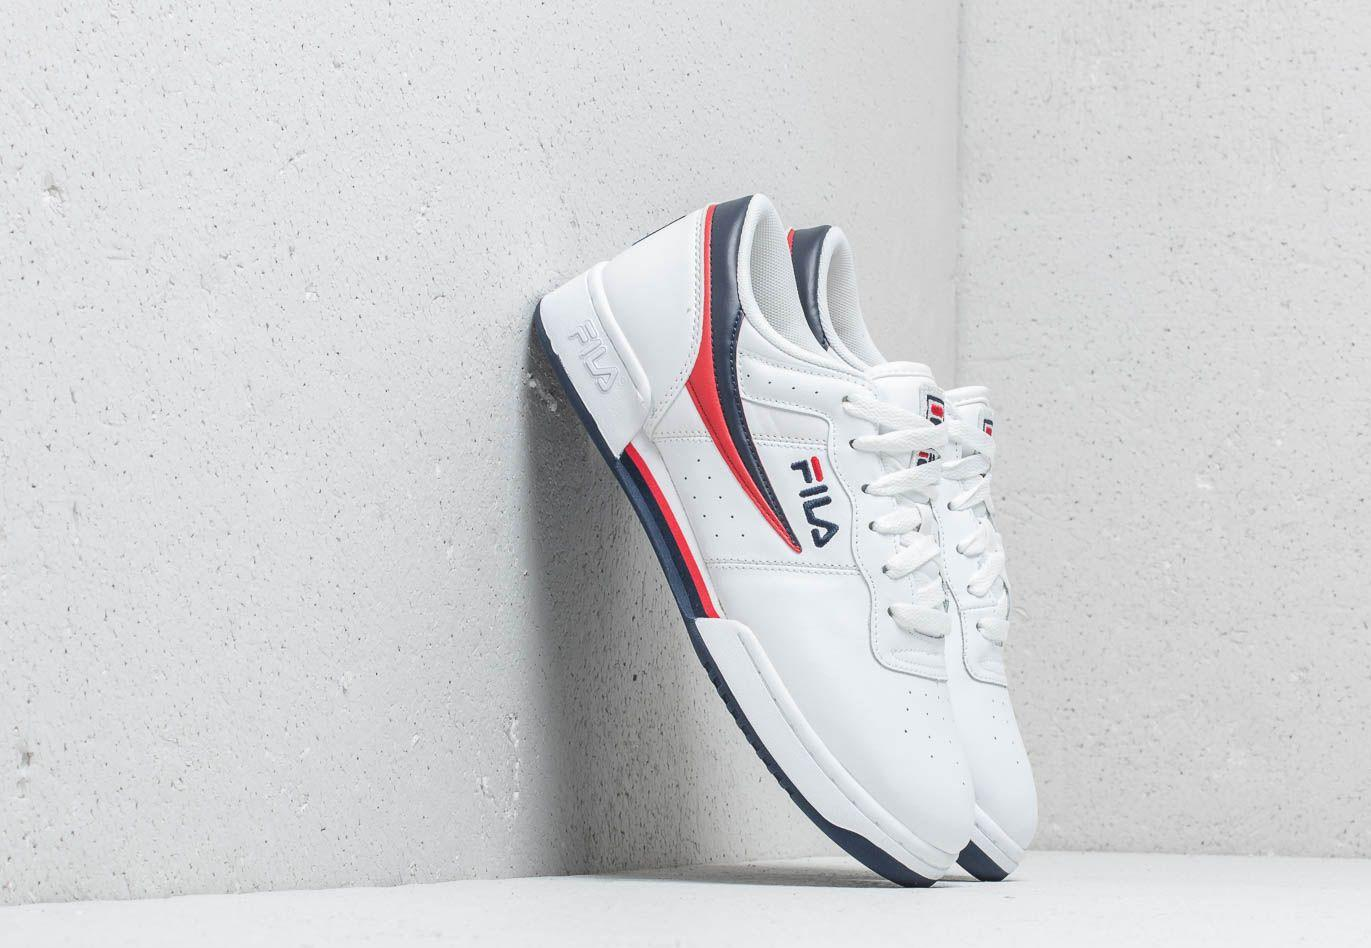 4909a5c2d2c7 Lyst - Fila Original Fitness White  Navy  Red in White for Men